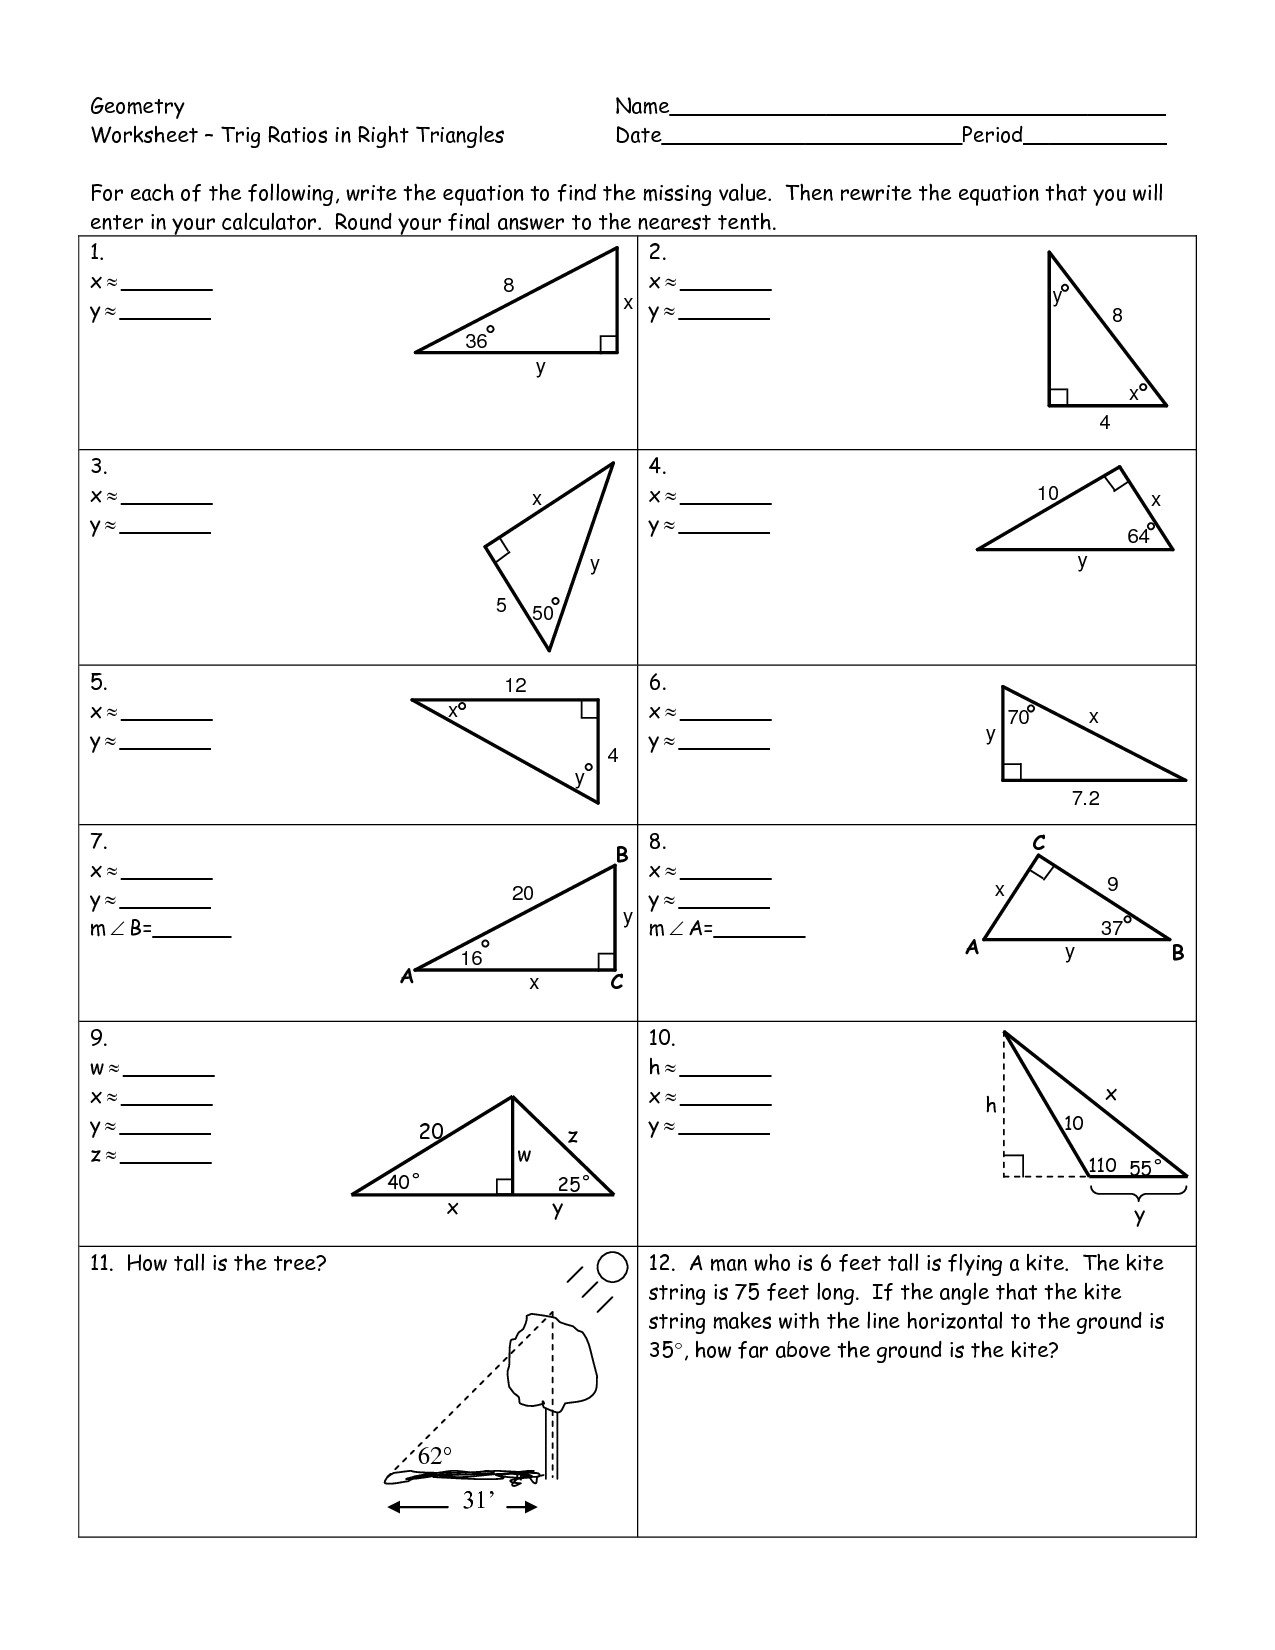 Brilliant Ideas Of Trigonometric Ratios Worksheet Answers Unique Or Trigonometric Ratios Worksheet Answers